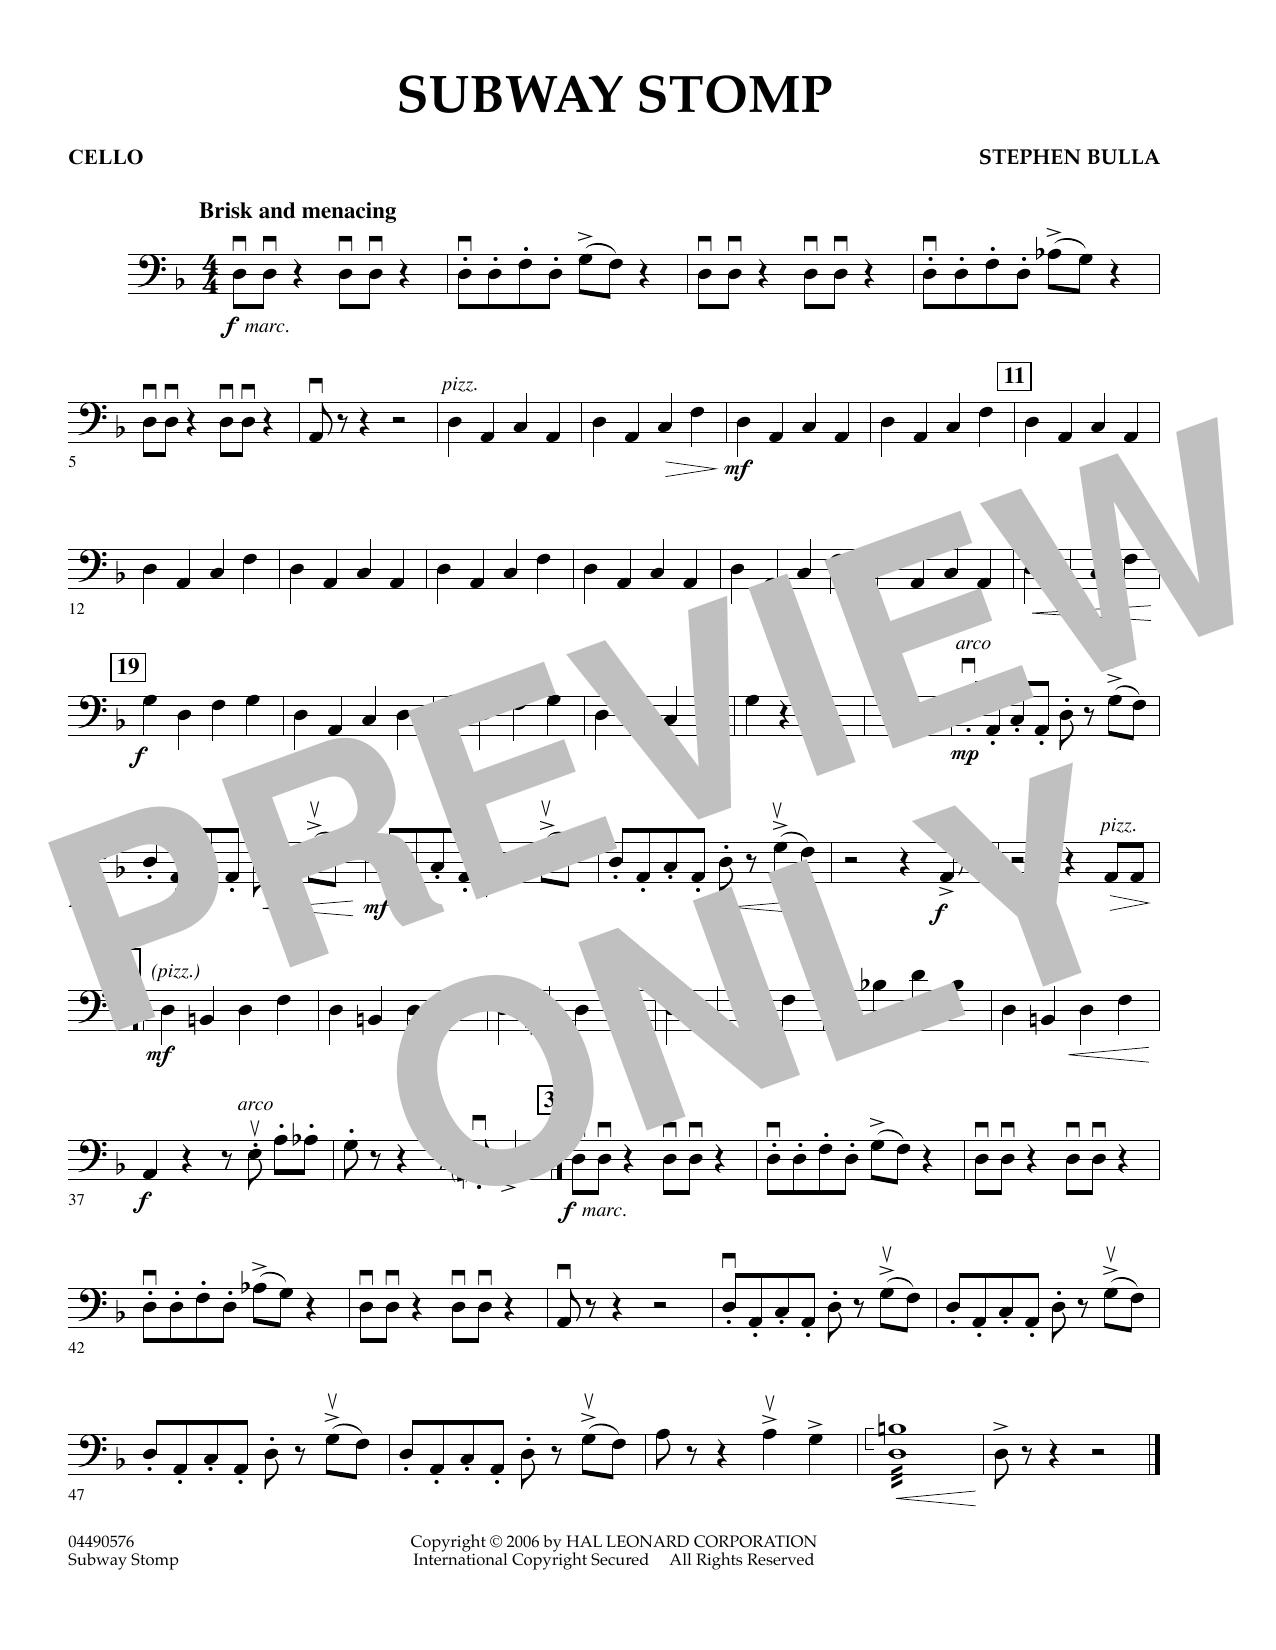 Subway Stomp - Cello (Orchestra)